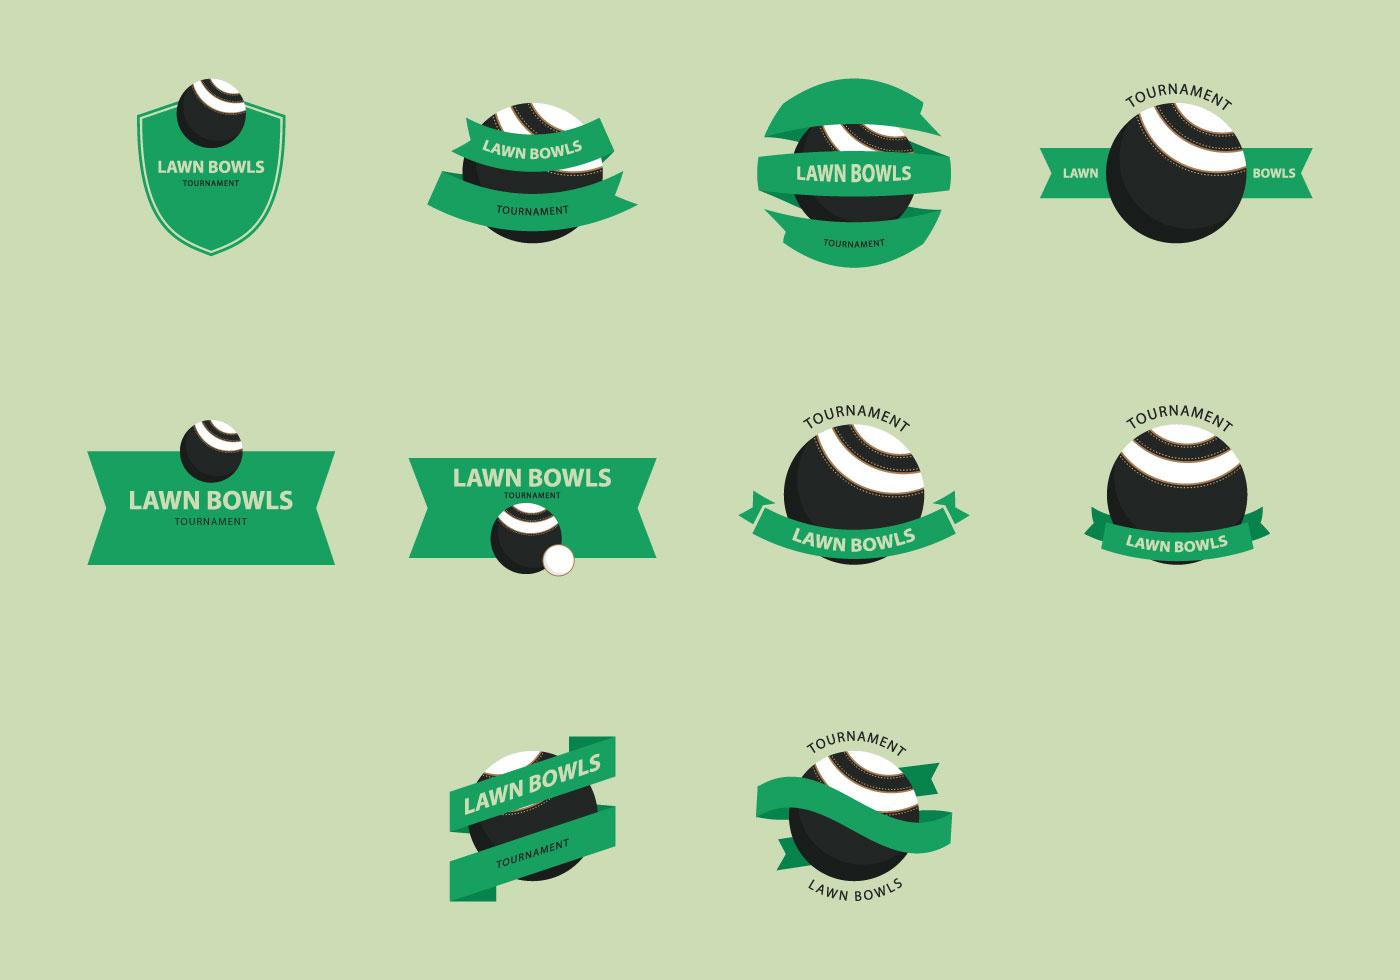 lawn bowls free vector art 786 free downloads